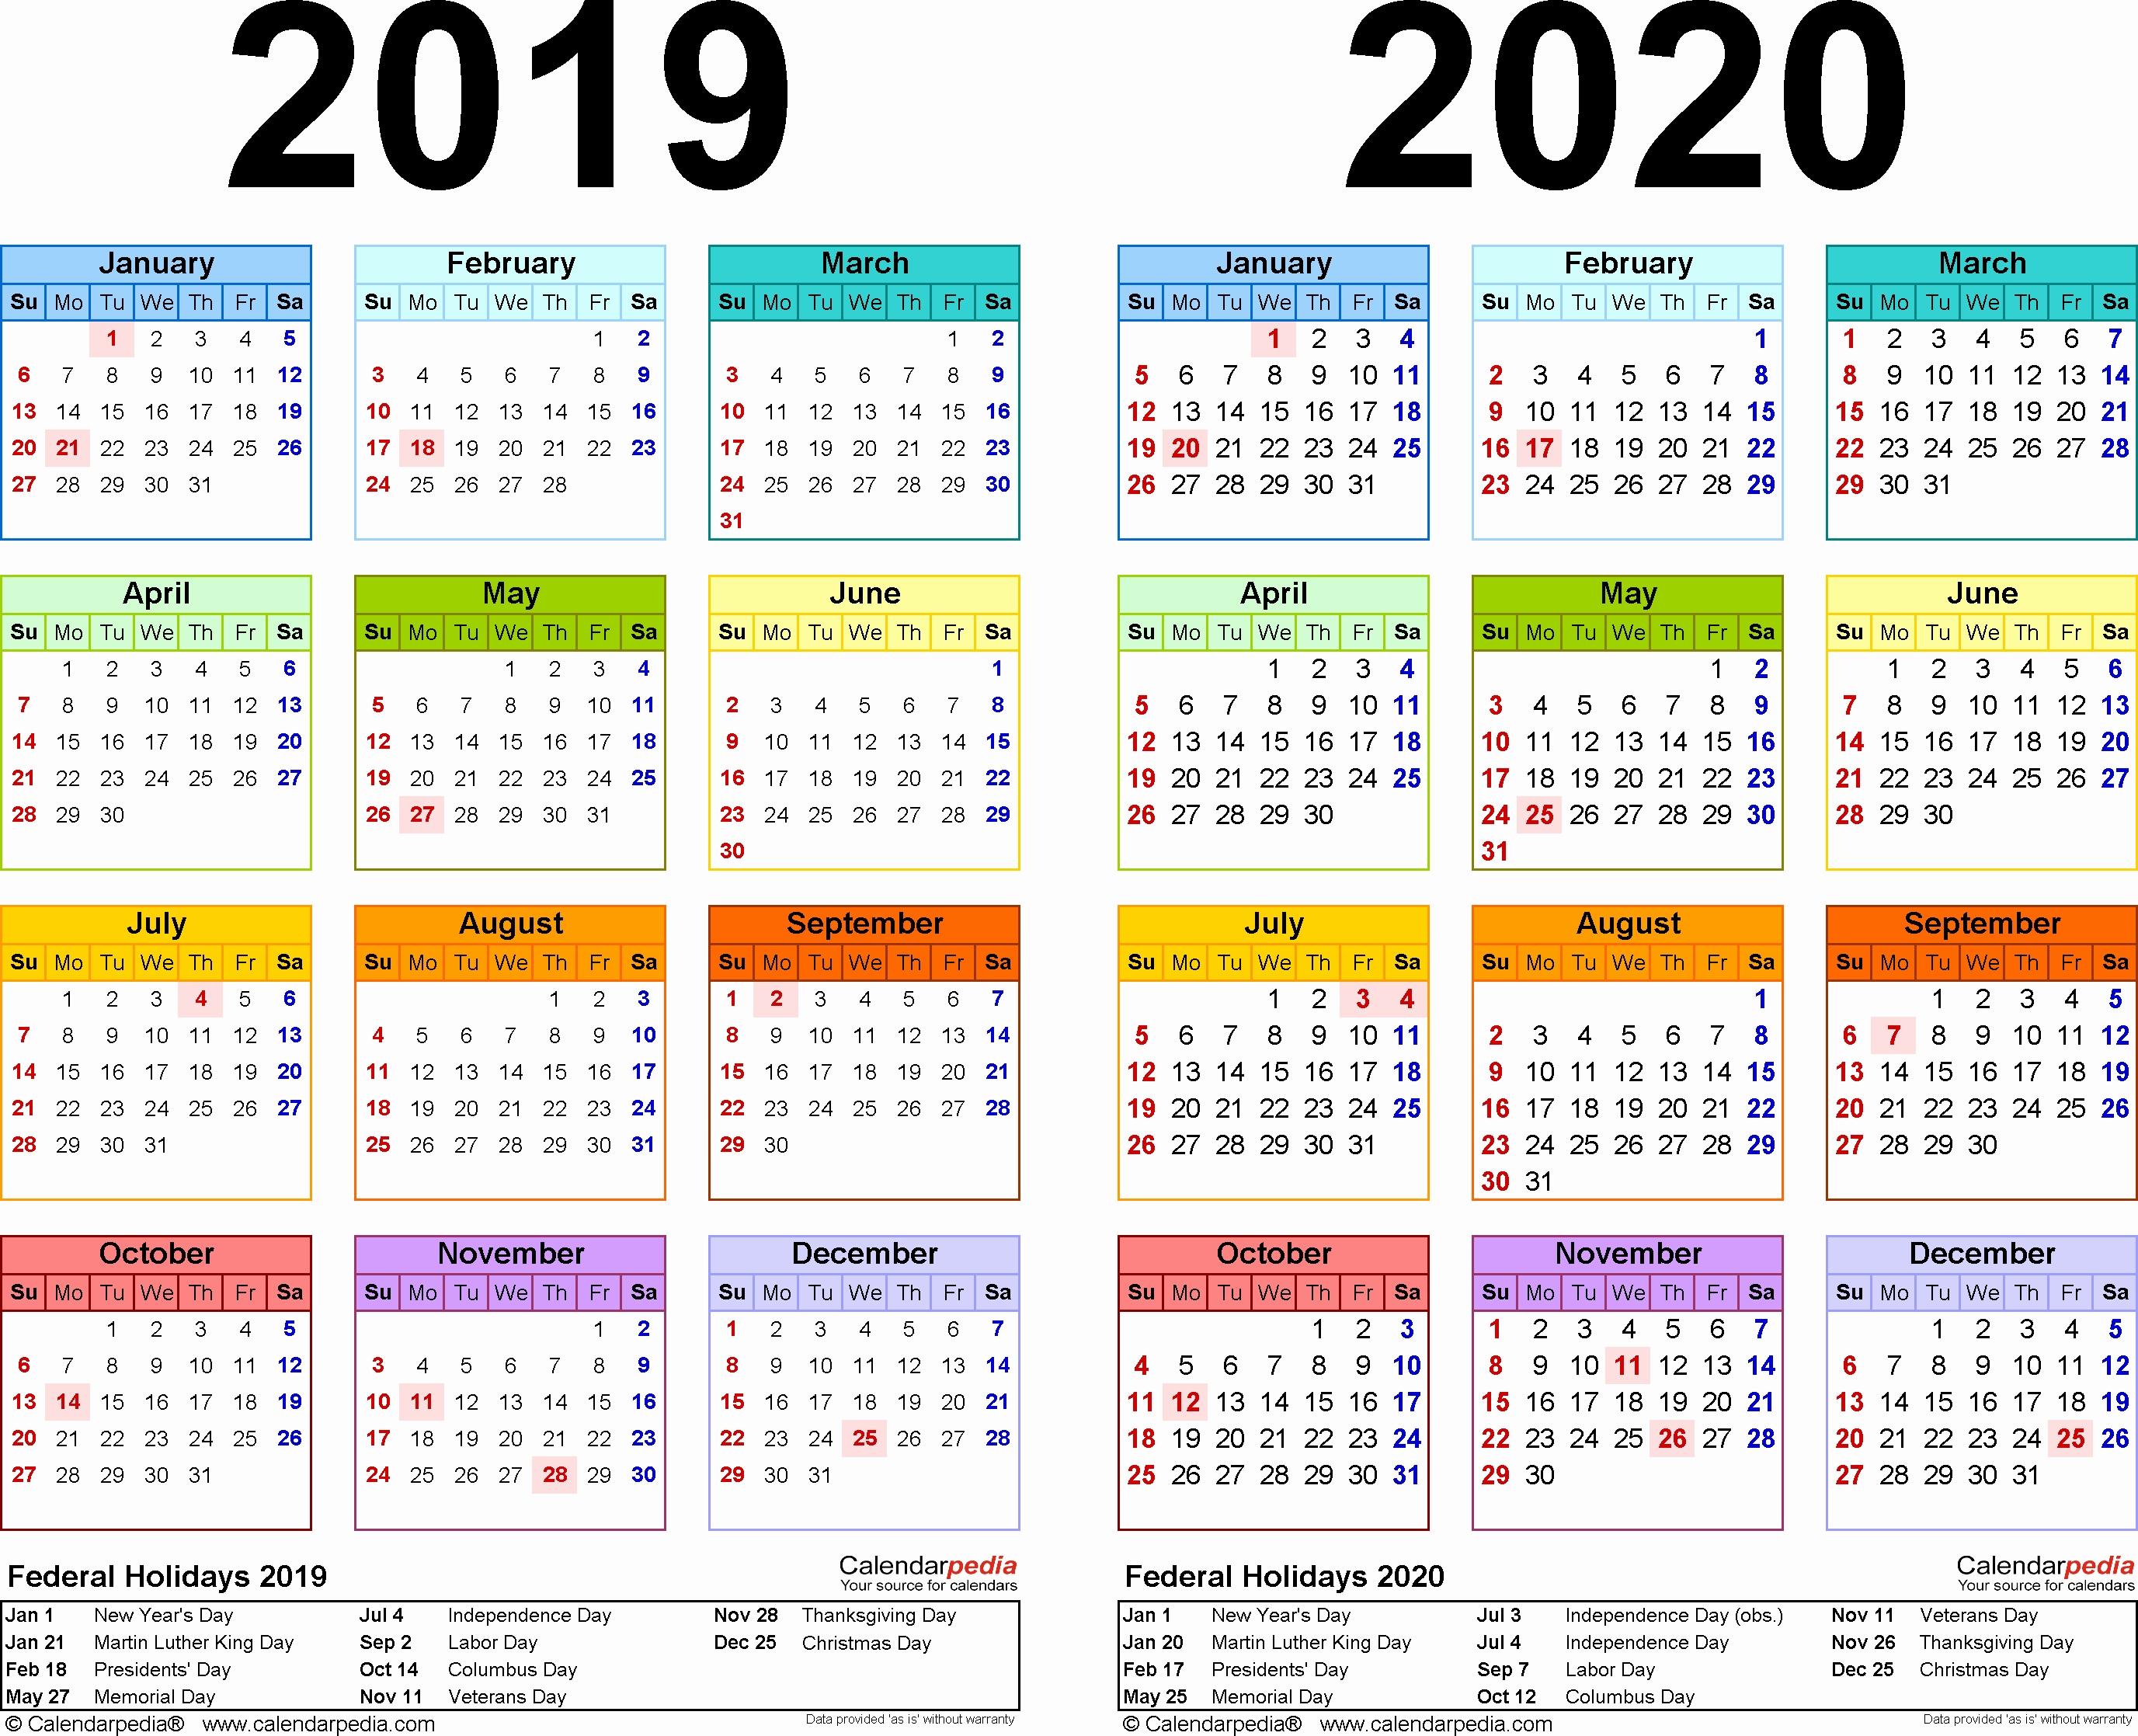 2019 Black Calendar In English Uk Year 2019 Calendar Calendar 2019 Remarkable 2020 Fiscal Year Calendar